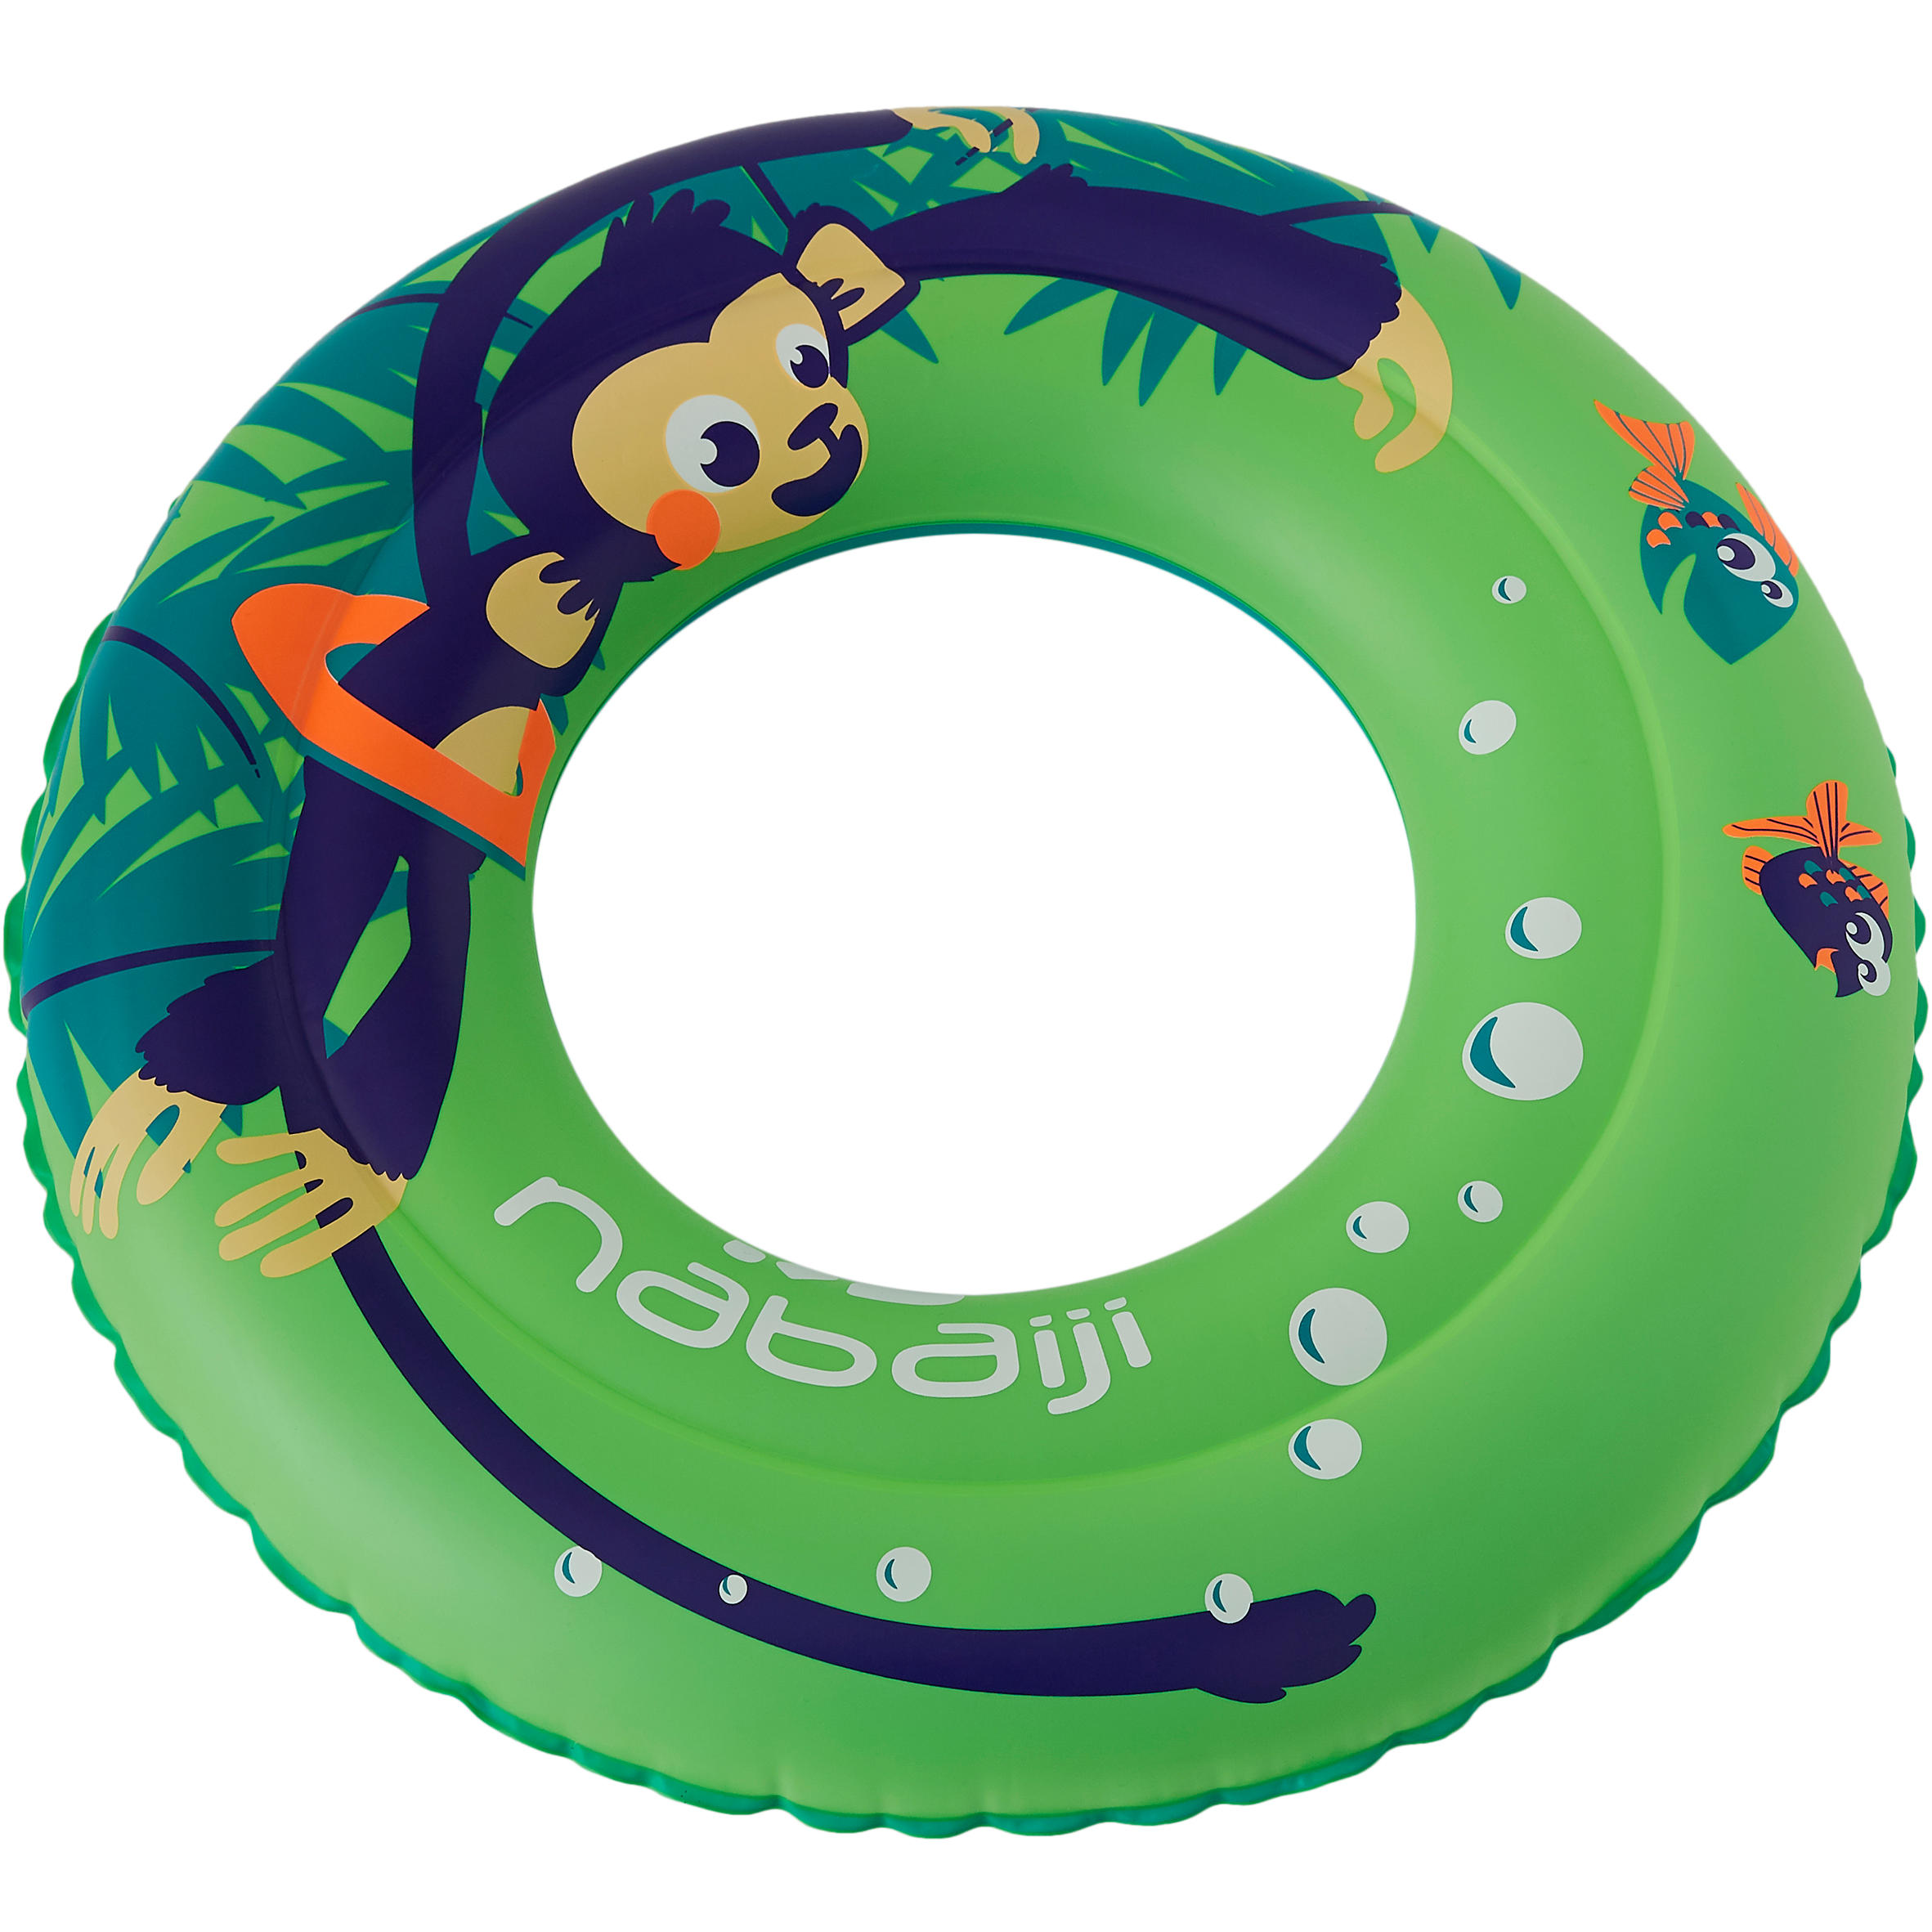 Children's Inflatable Swim Ring 3-6 Years 51 cm - Monkey Print Blue